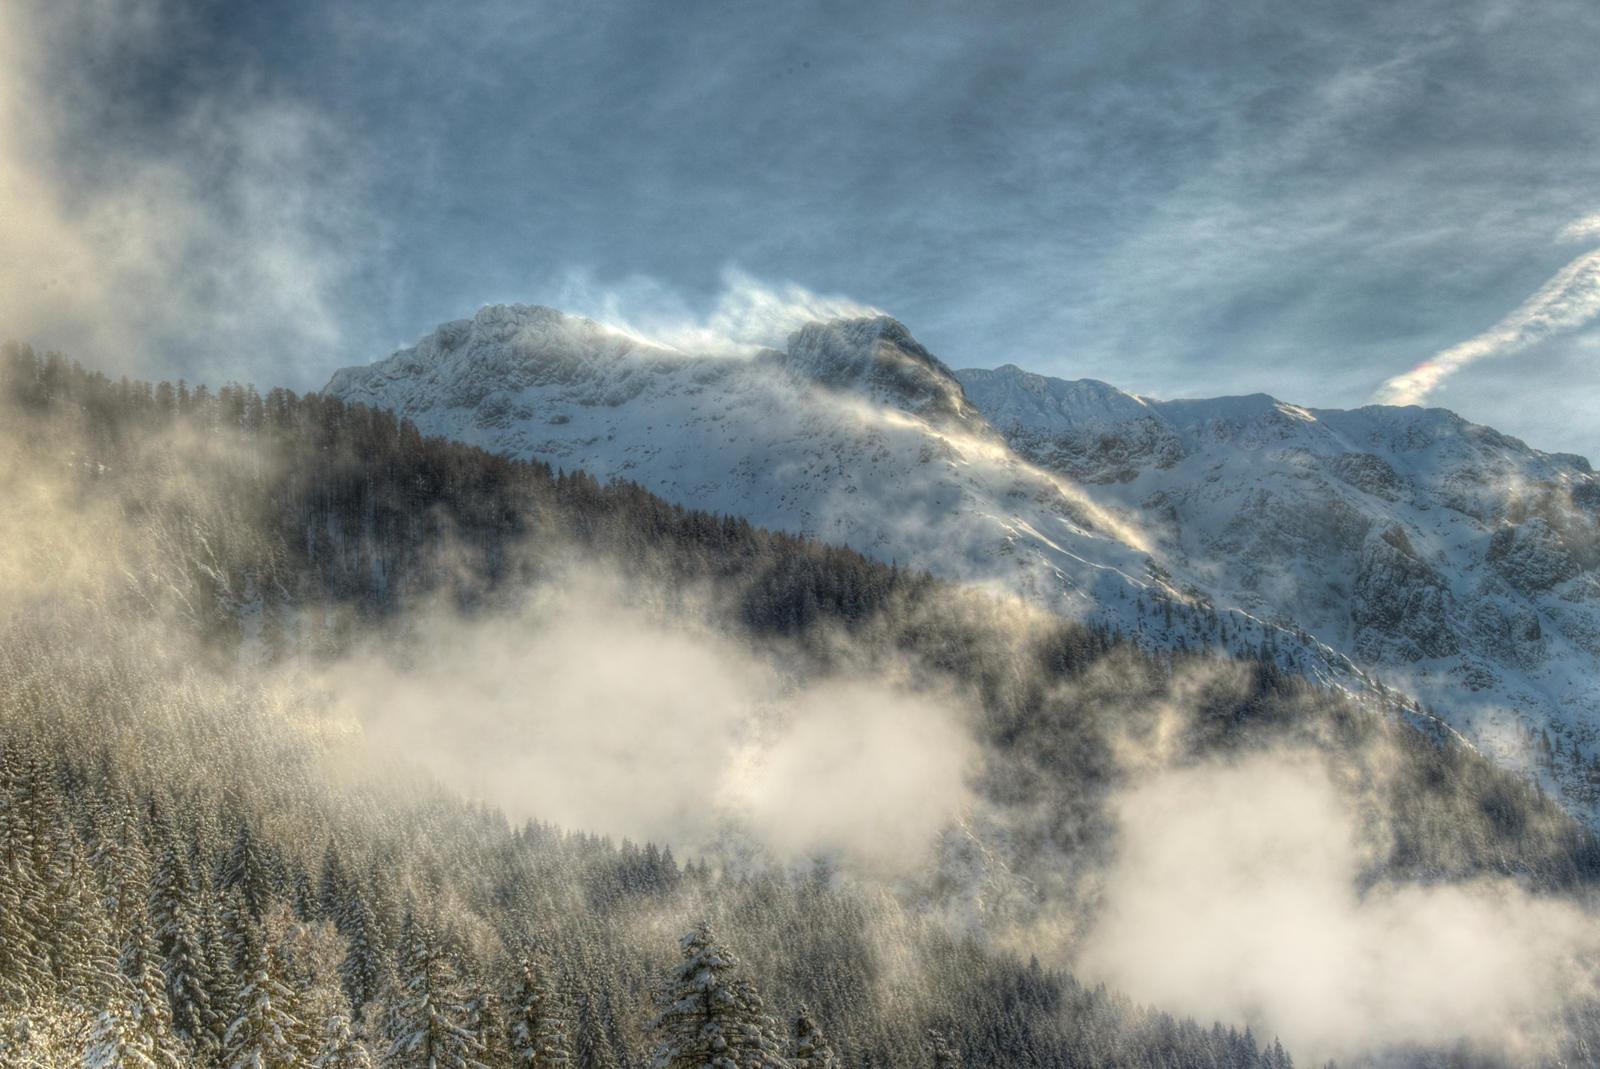 Stormy Heights by Burtn